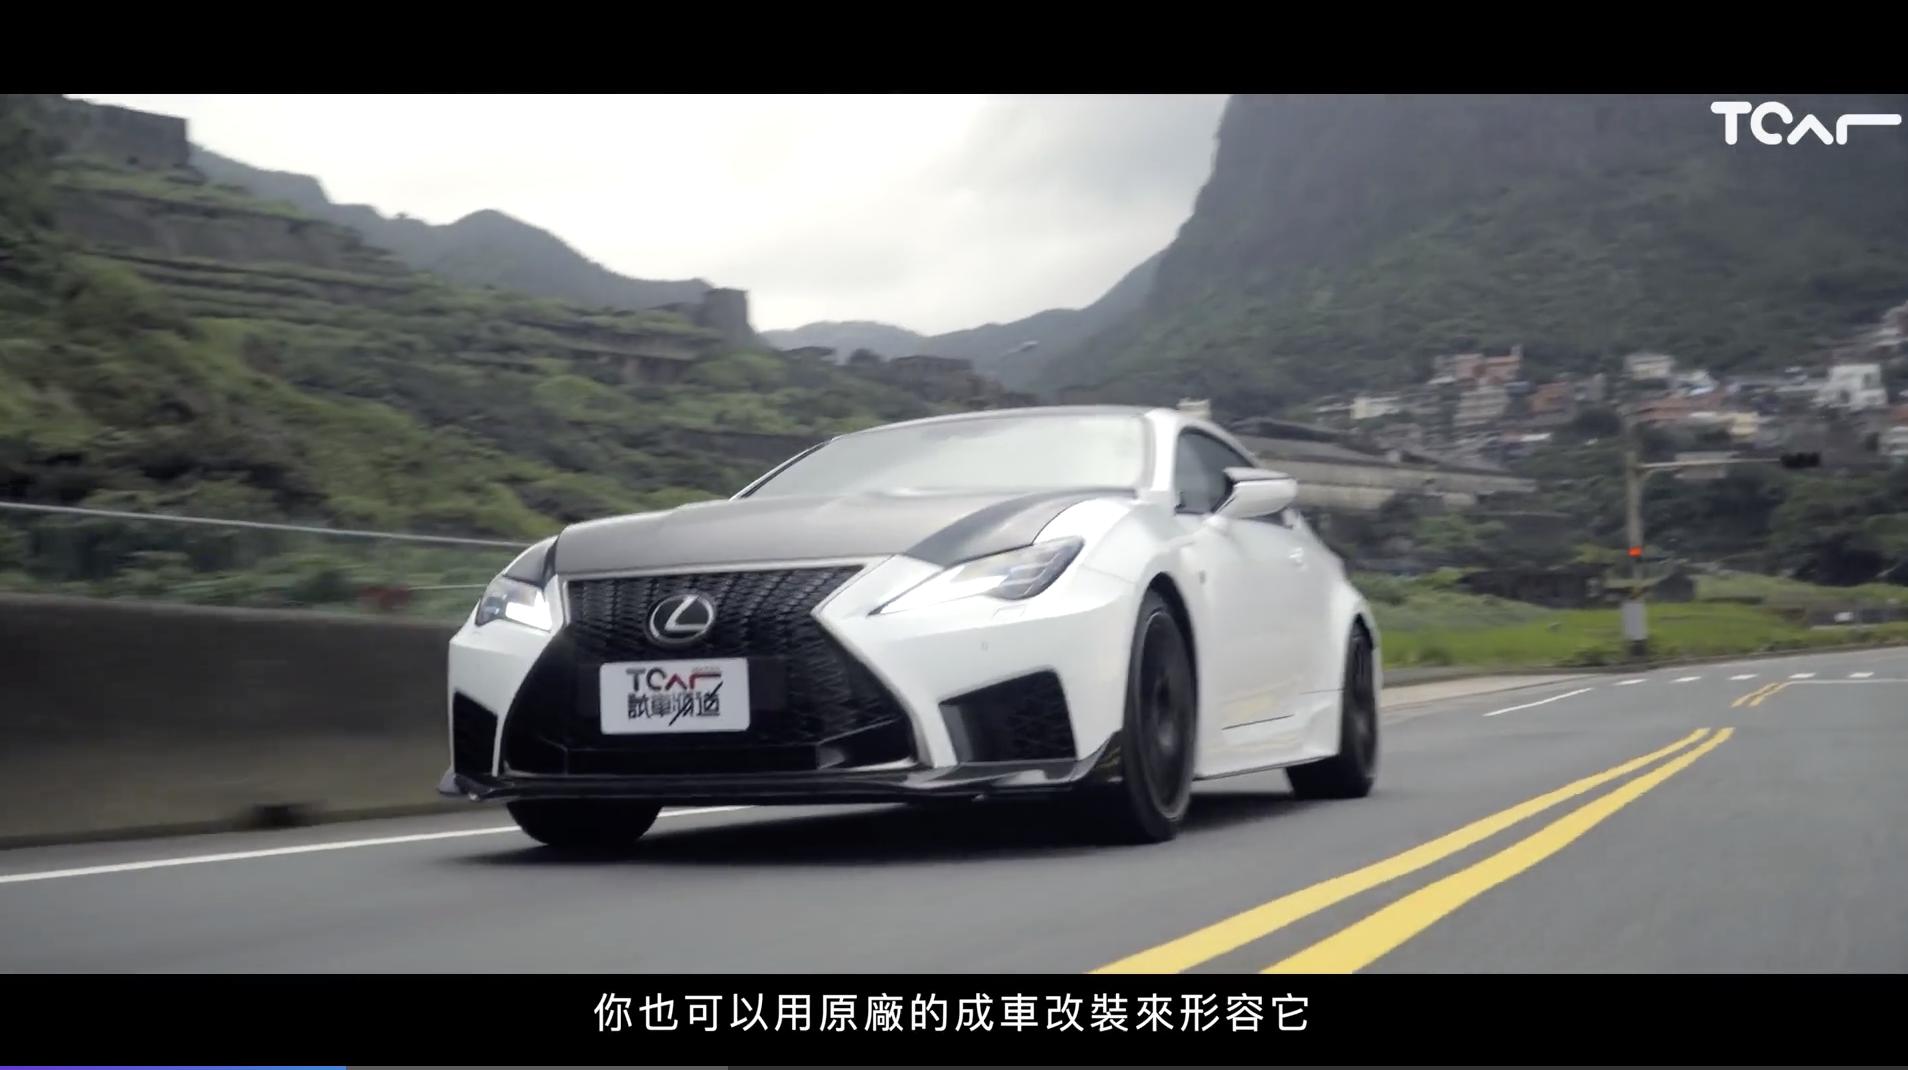 NA悠揚樂章 Lexus RC F Track Edition 跑車試駕 - TCar